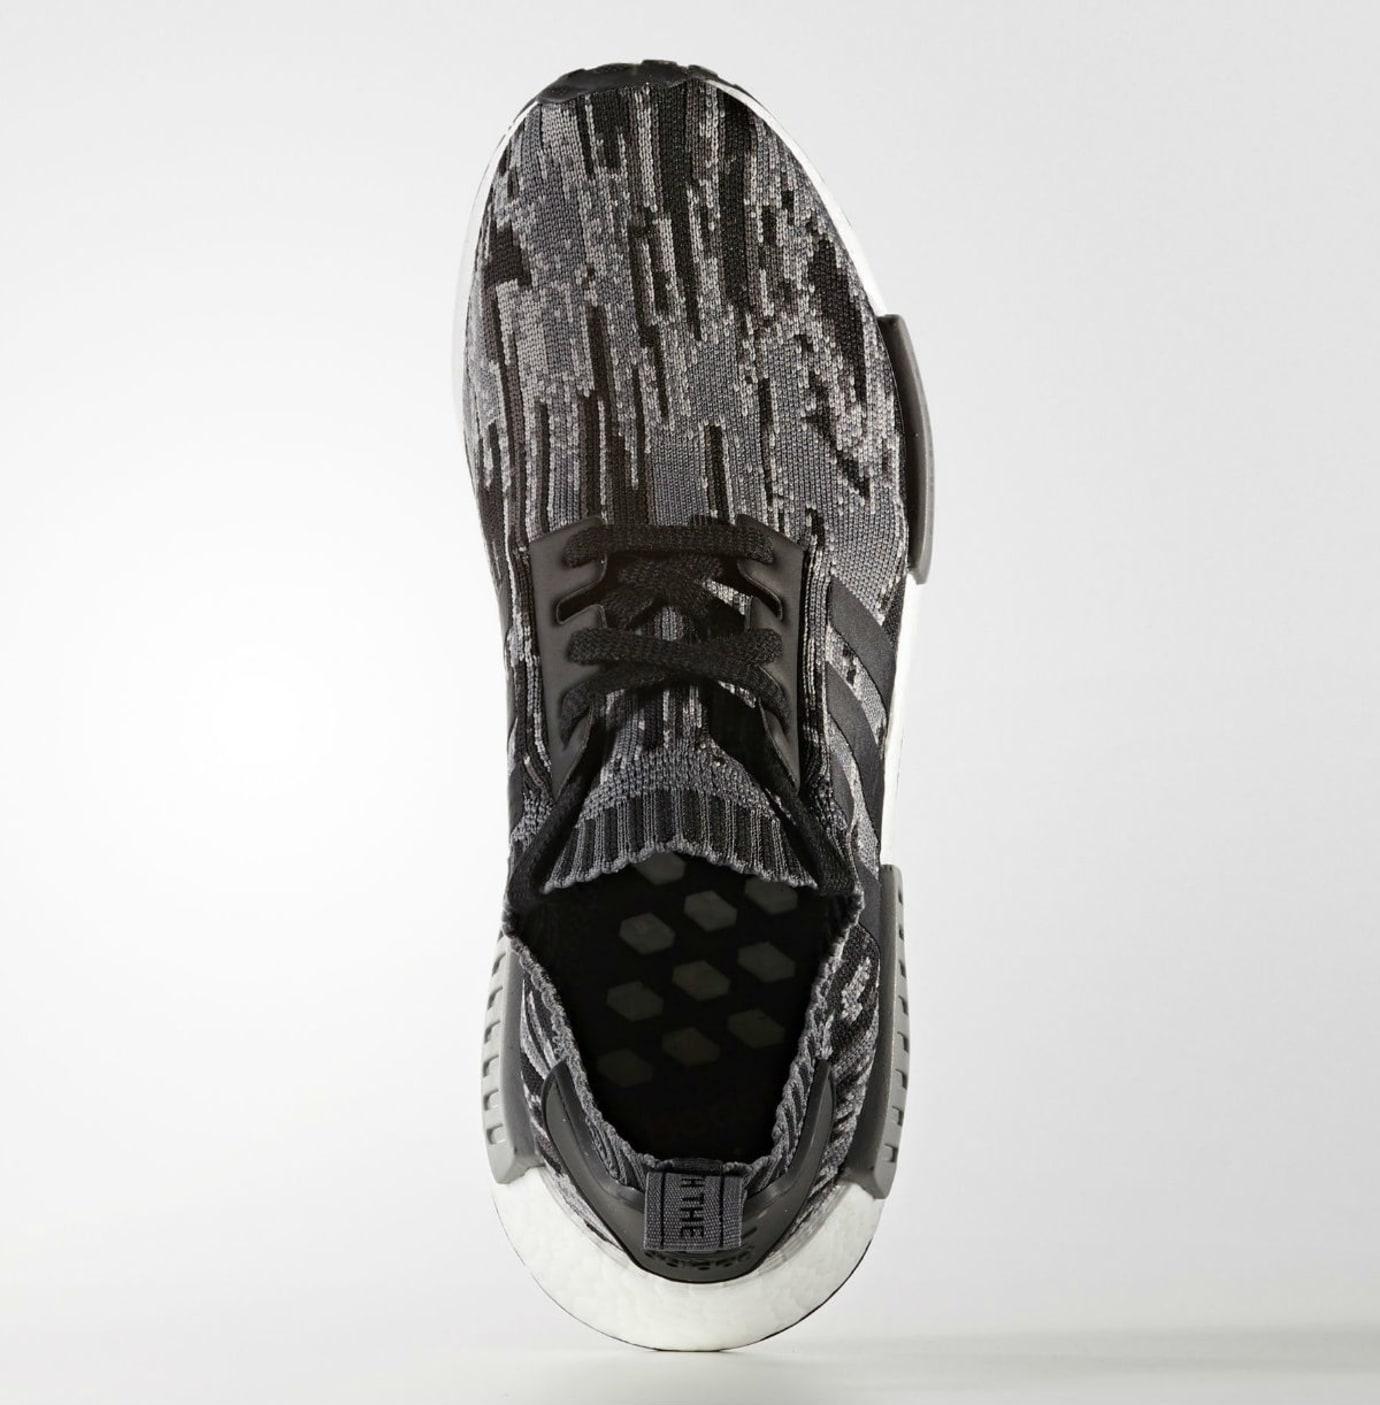 41e8cb3d33fa9 Adidas NMD R1 Primeknit Glitch Camo Core Black Grey Three Release Date Top  BZ0223